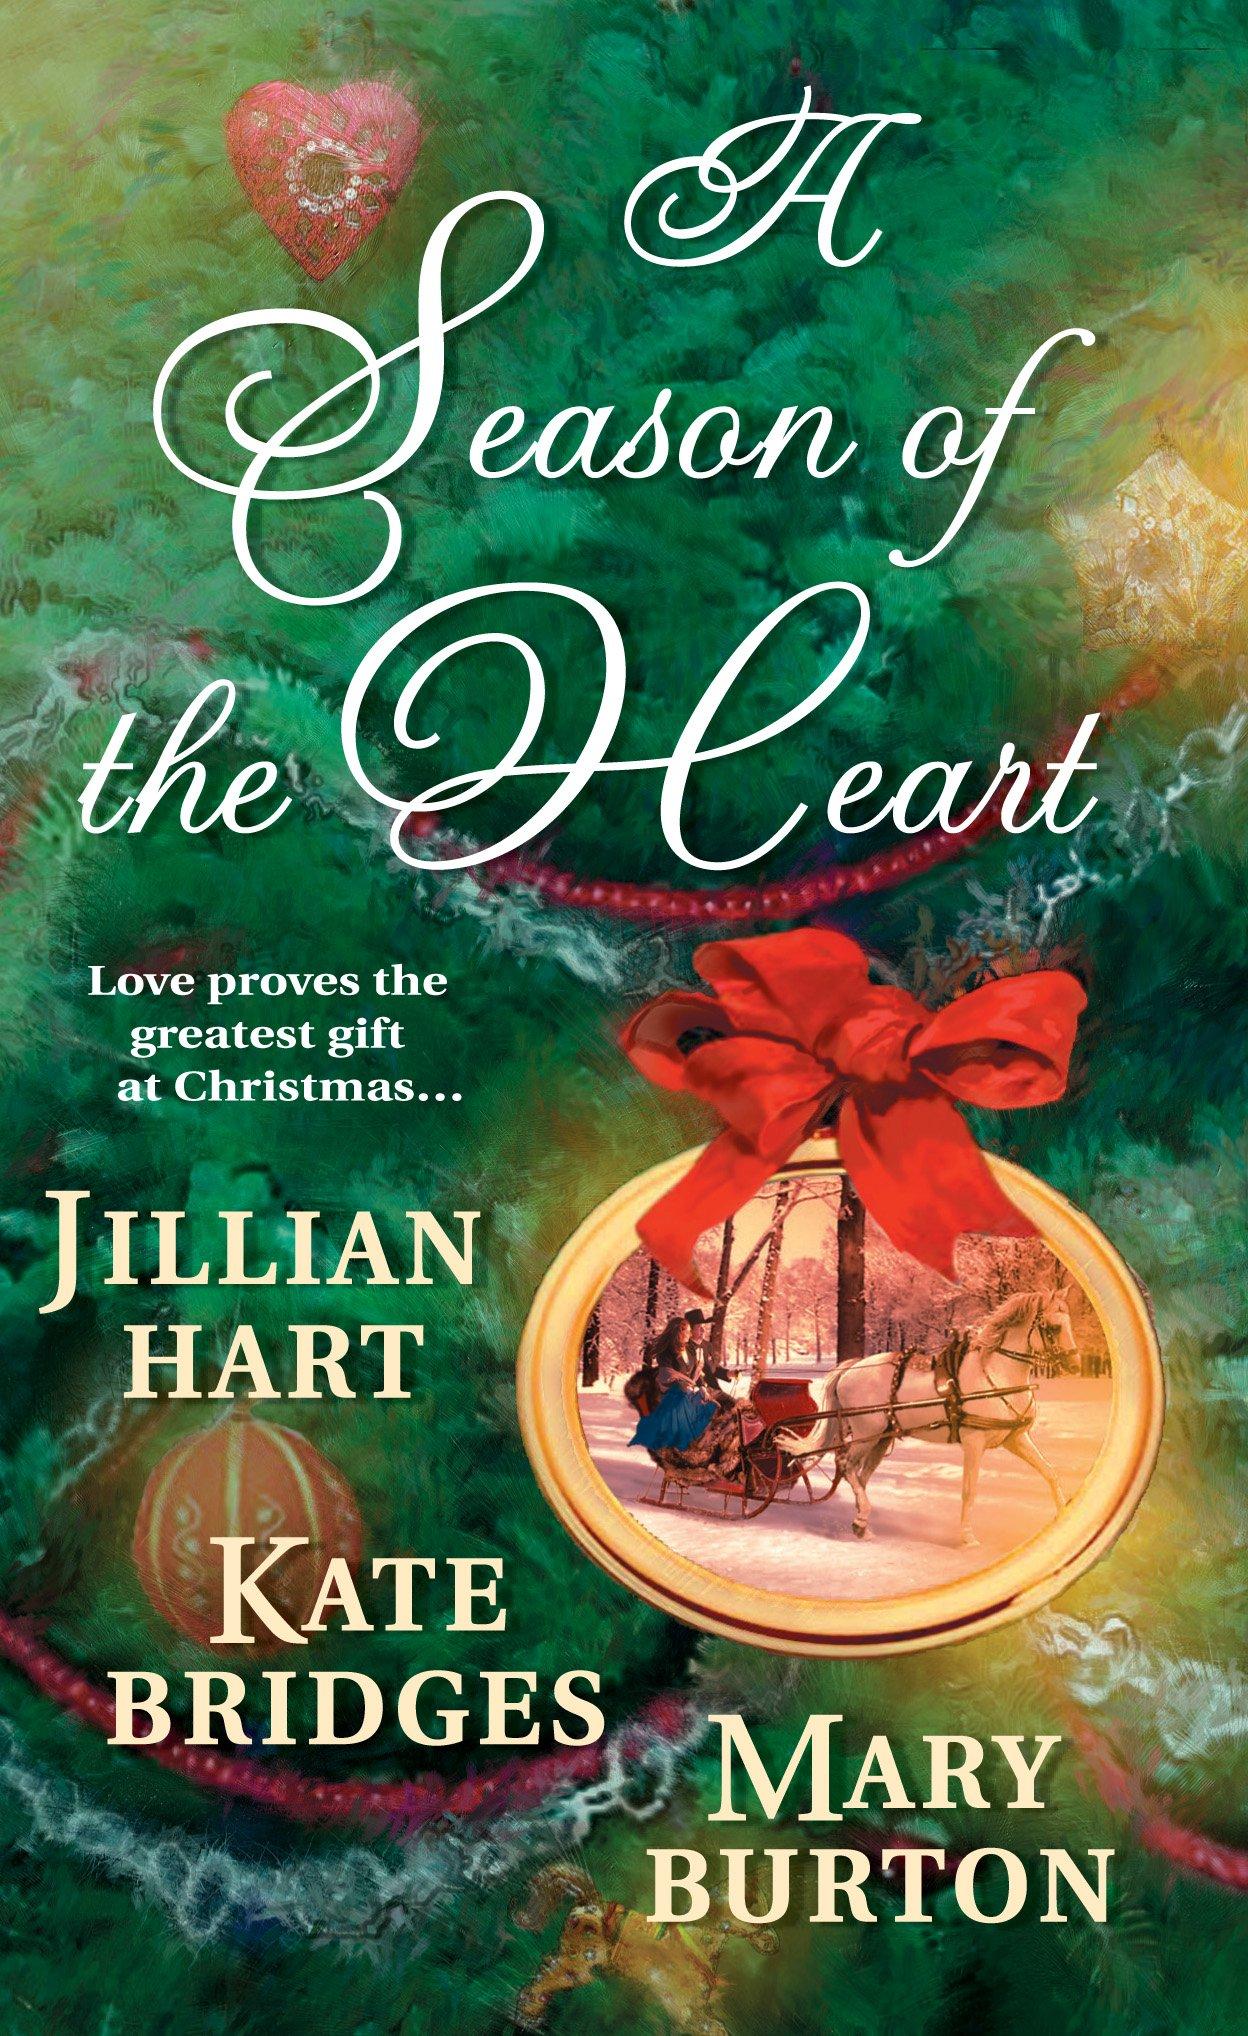 Download A Season of the Heart: Rocky Mountain Christmas/The Christmas Gifts/The Christmas Charm ebook